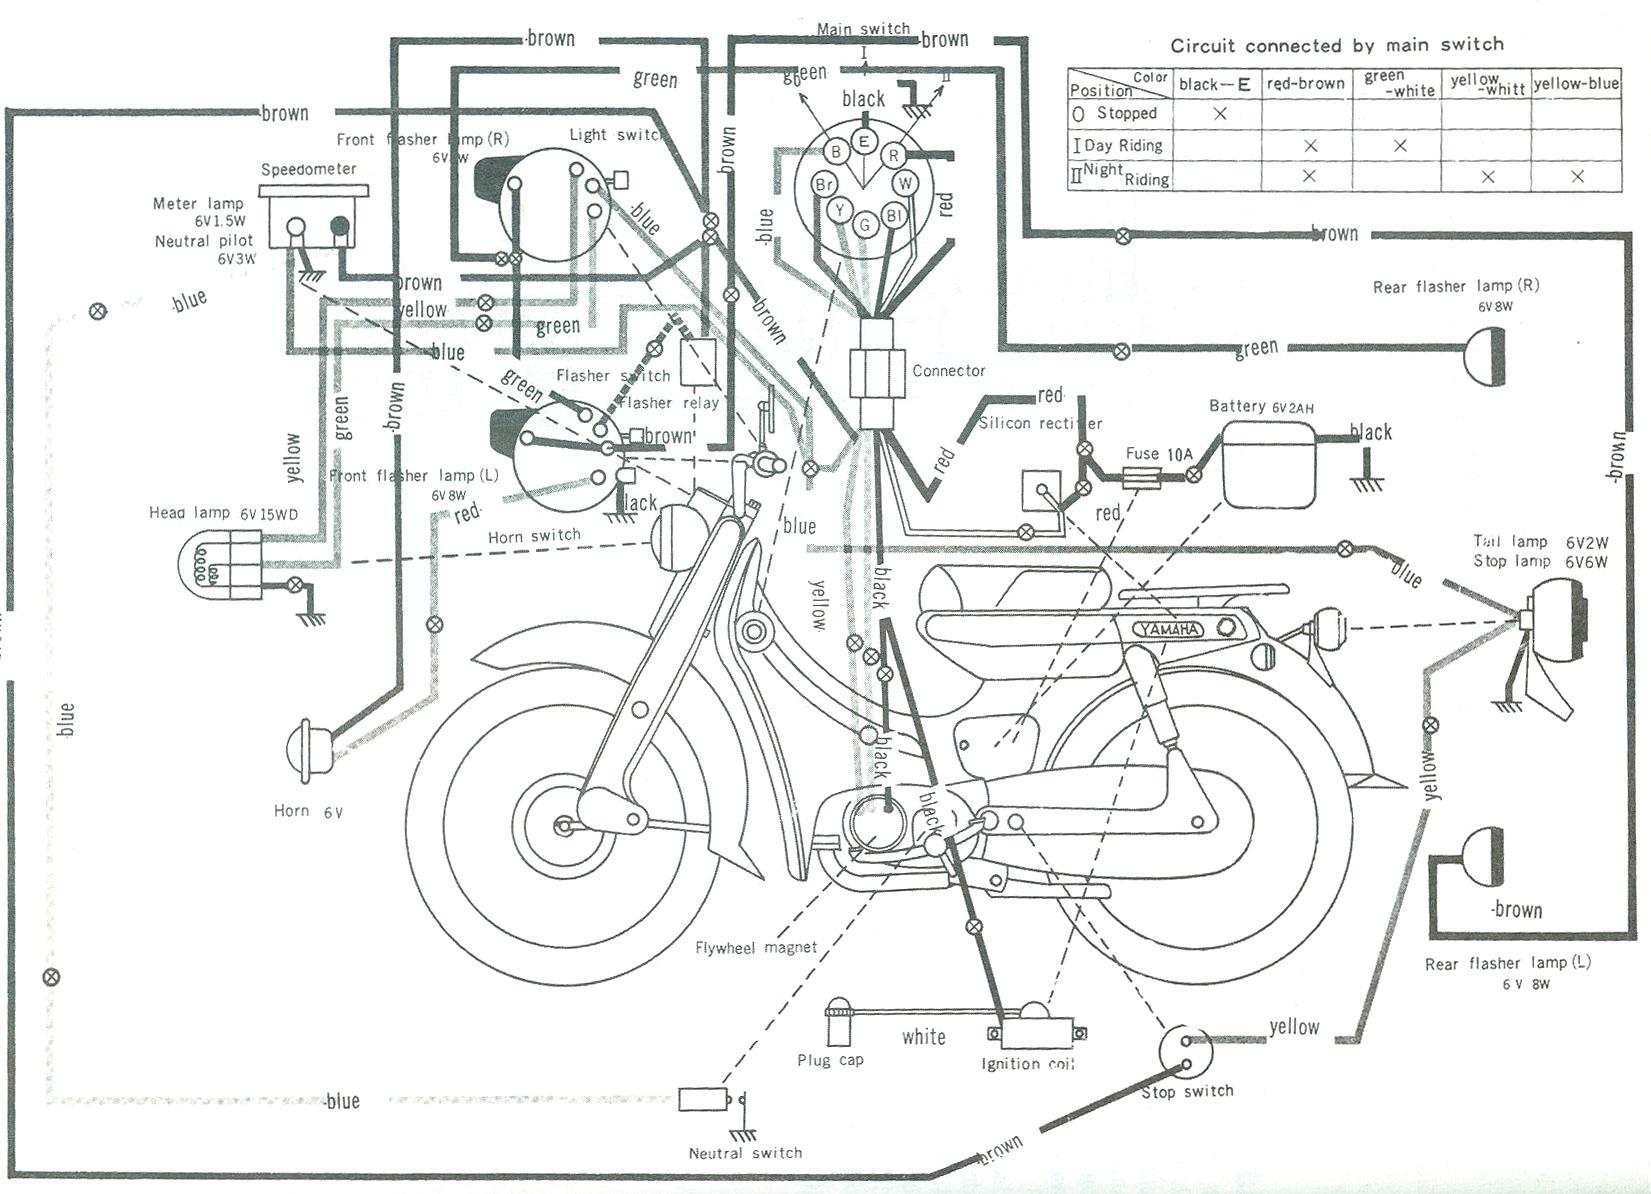 Beautiful Yamaha Aerox Wiring Diagram Embellishment - Electrical and ...